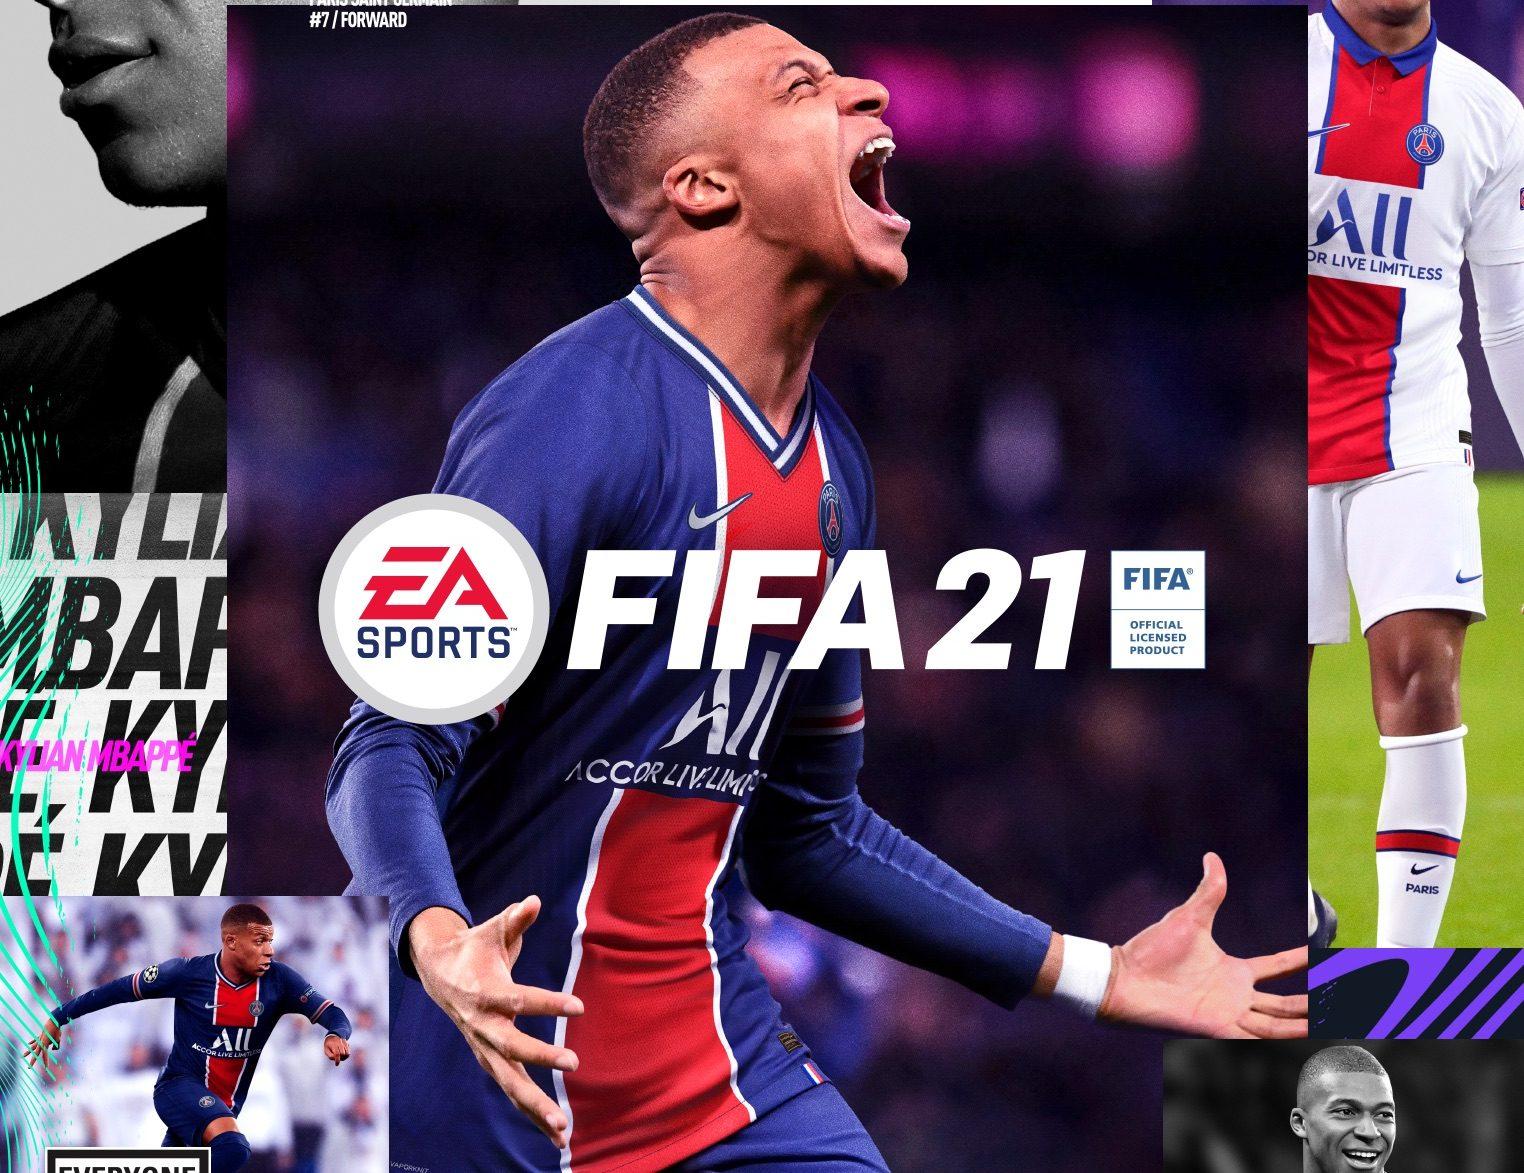 Новата ни анкета е посветена на FIFA21